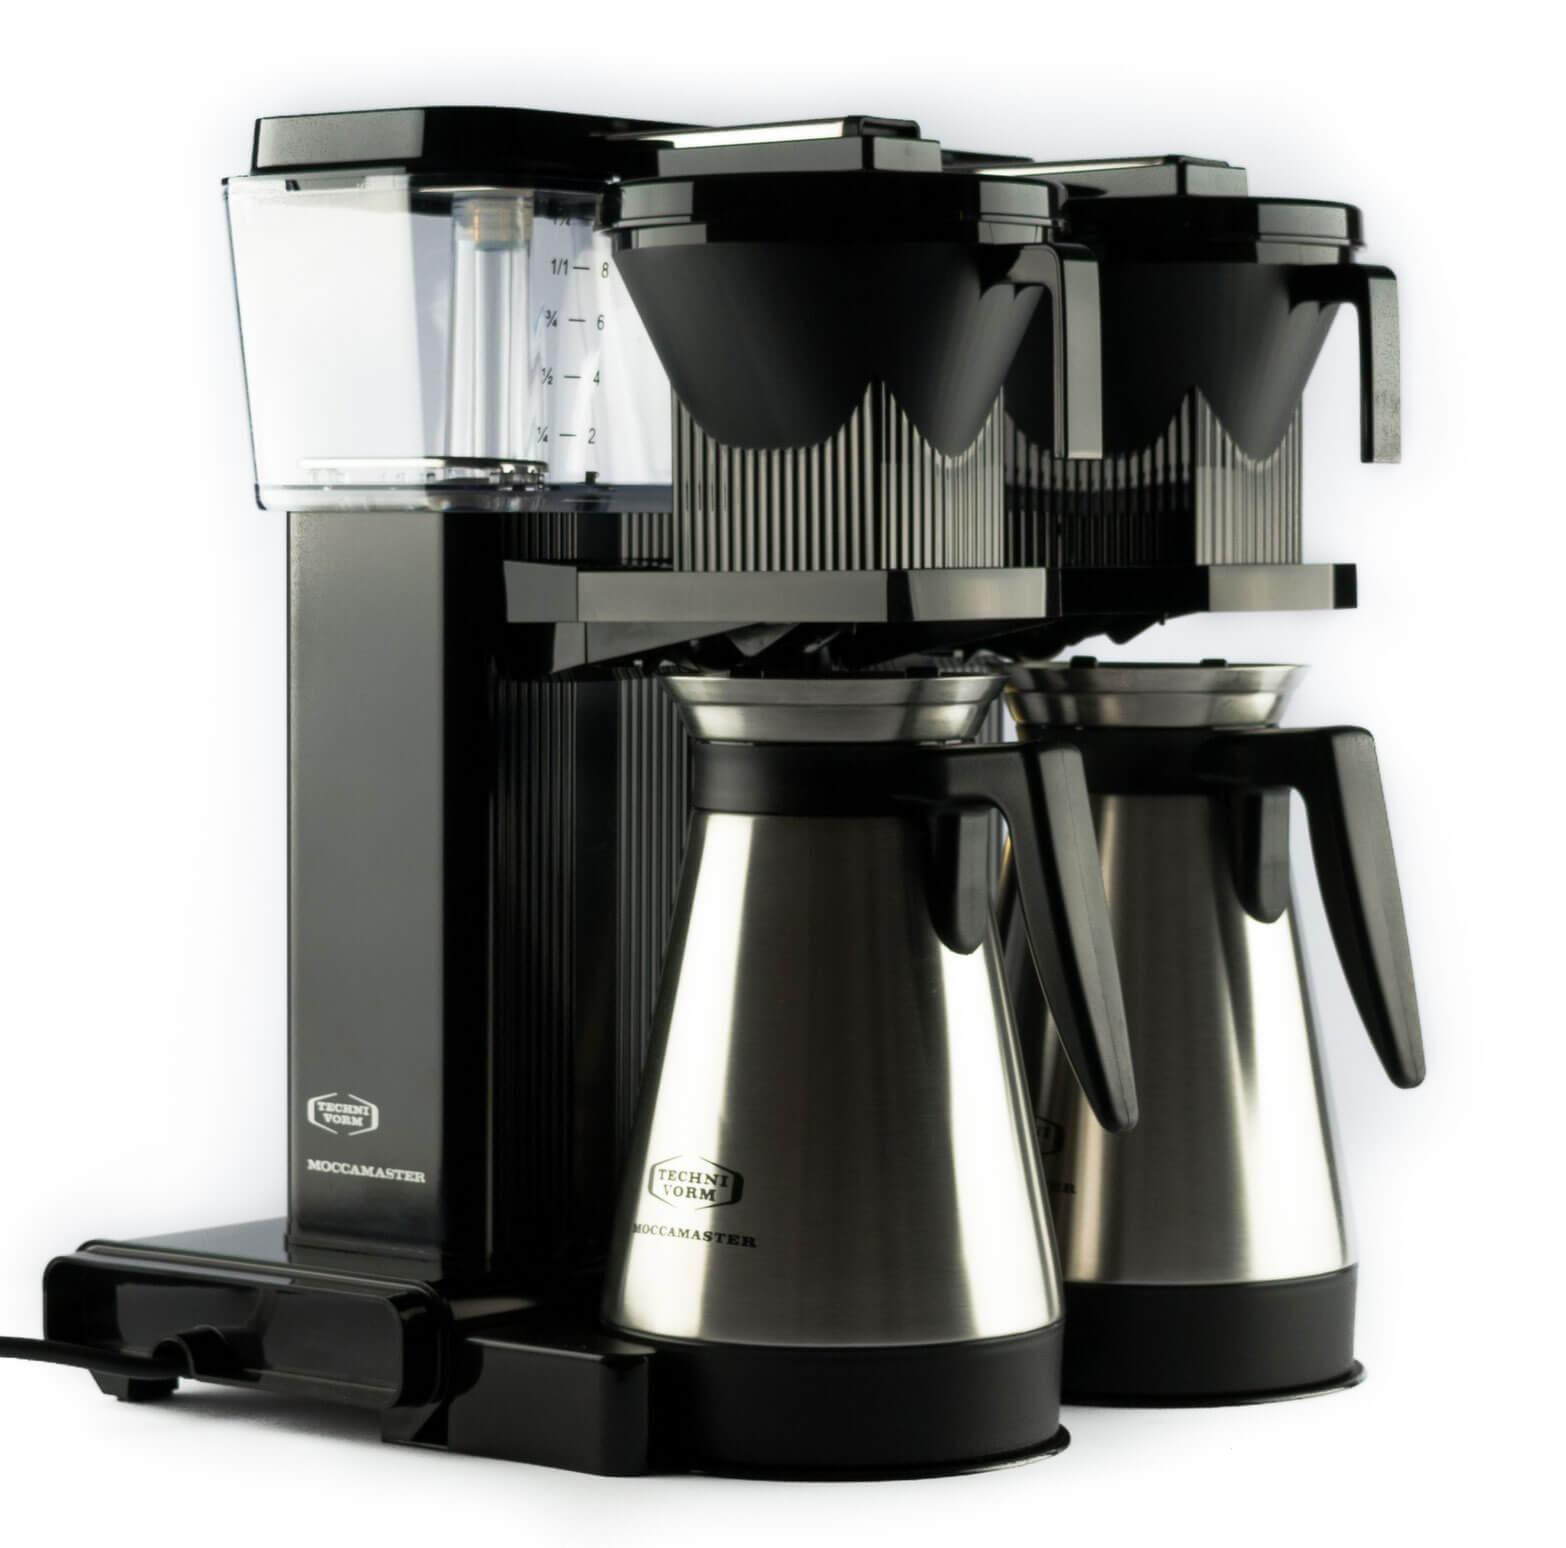 Moccamaster Kaffeeautomat KBGT20 | Kamasega